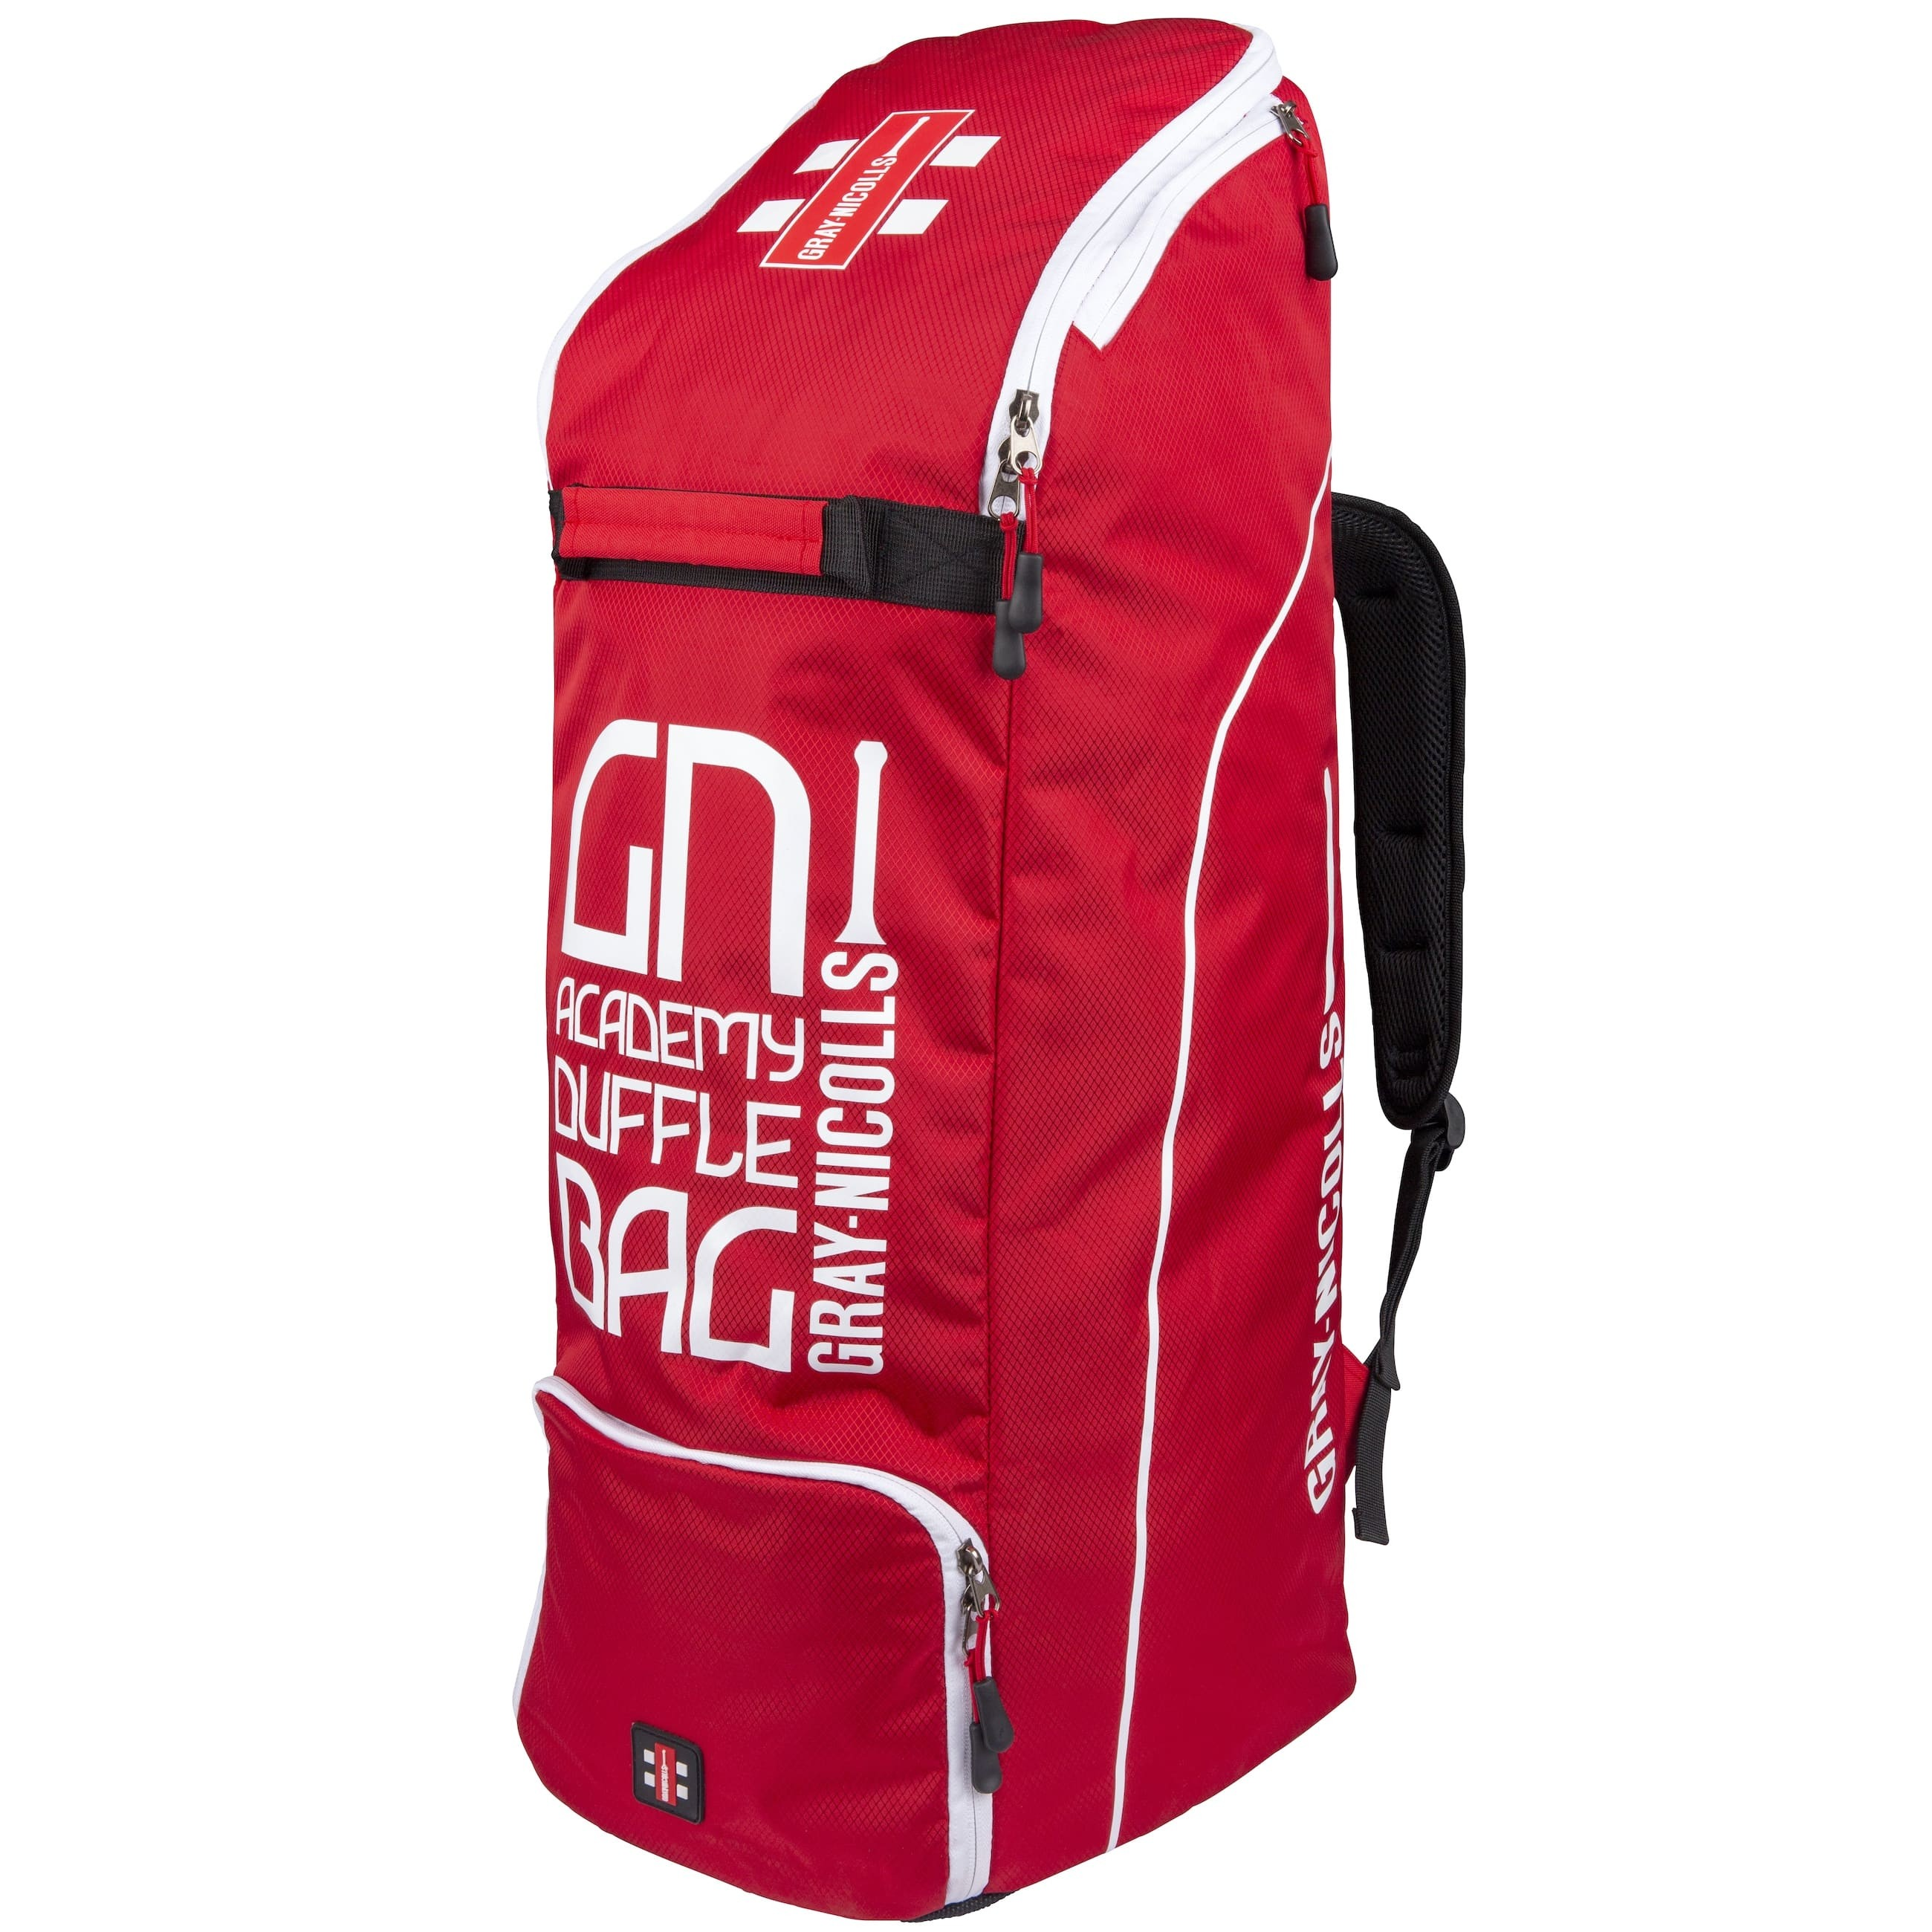 2021 Gray Nicolls Academy Duffle Cricket Bag - Red